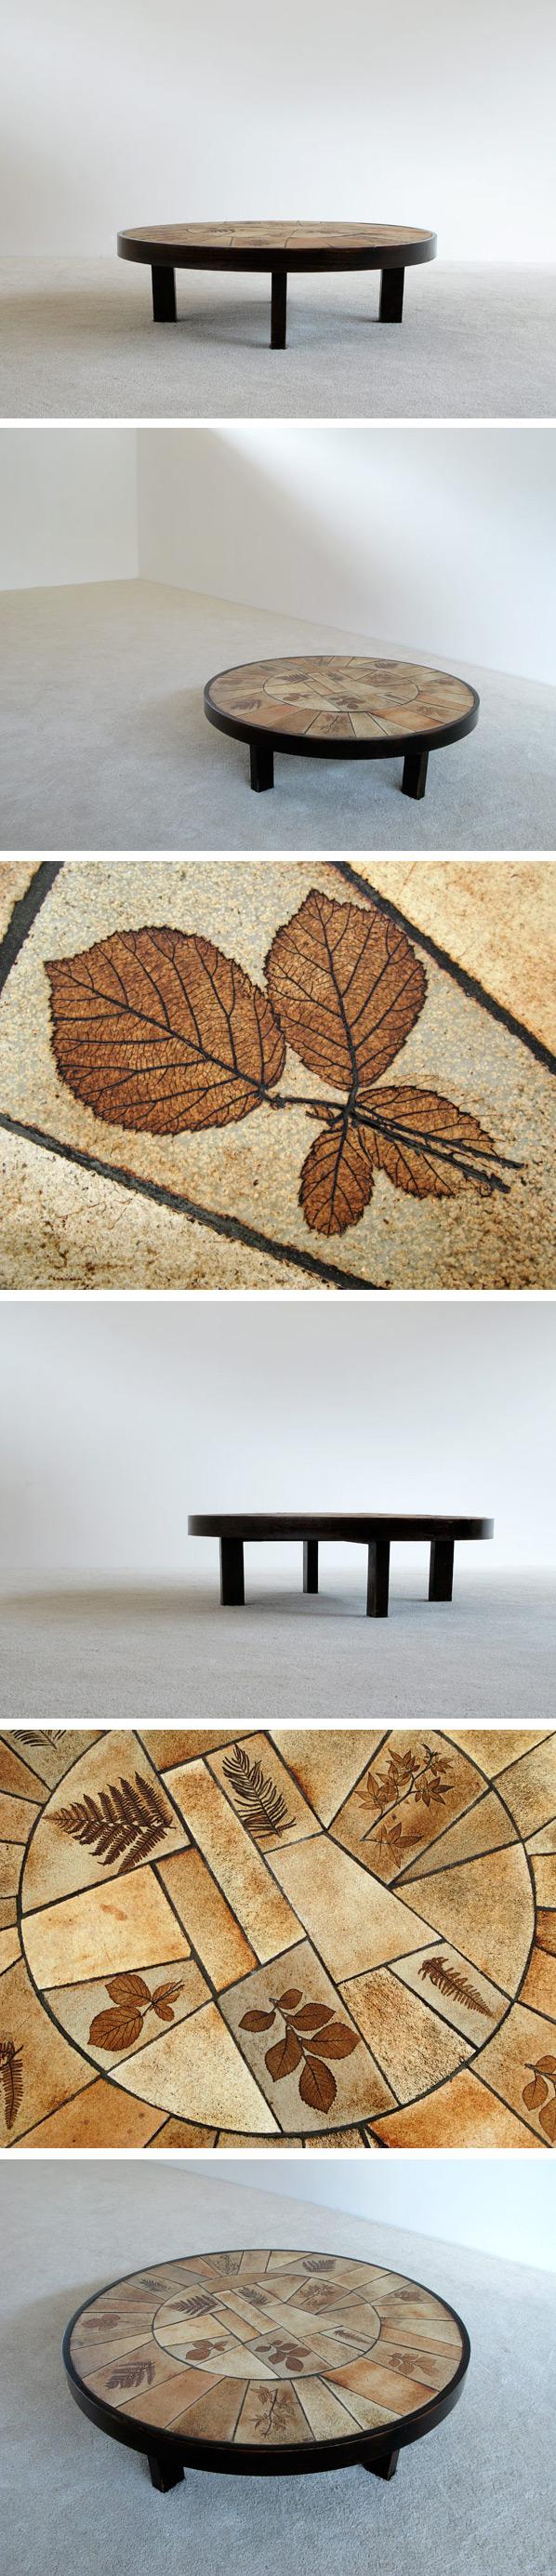 Ceramic Coffee Table Le Duc Raymond Vallauris 1960 Large